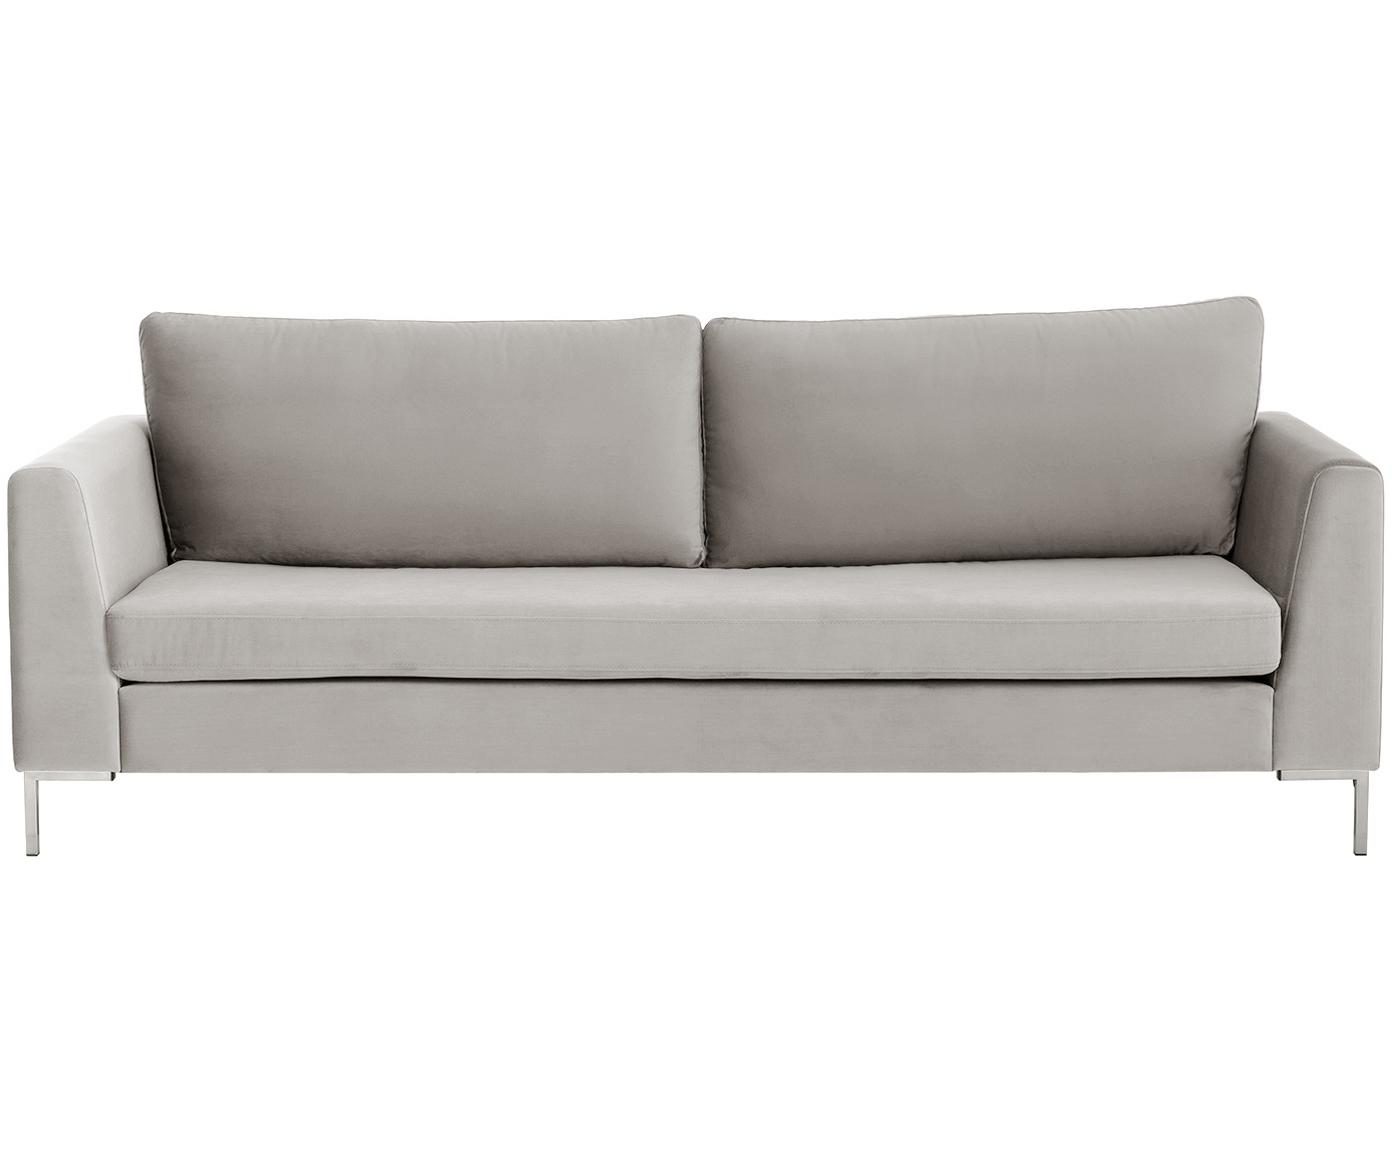 Samt-Sofa Luna (3-Sitzer), Bezug: Samt (Polyester) 80.000 S, Gestell: Massives Buchenholz, Füße: Metall, galvanisiert, Samt Beige, Silber, B 230 x T 95 cm